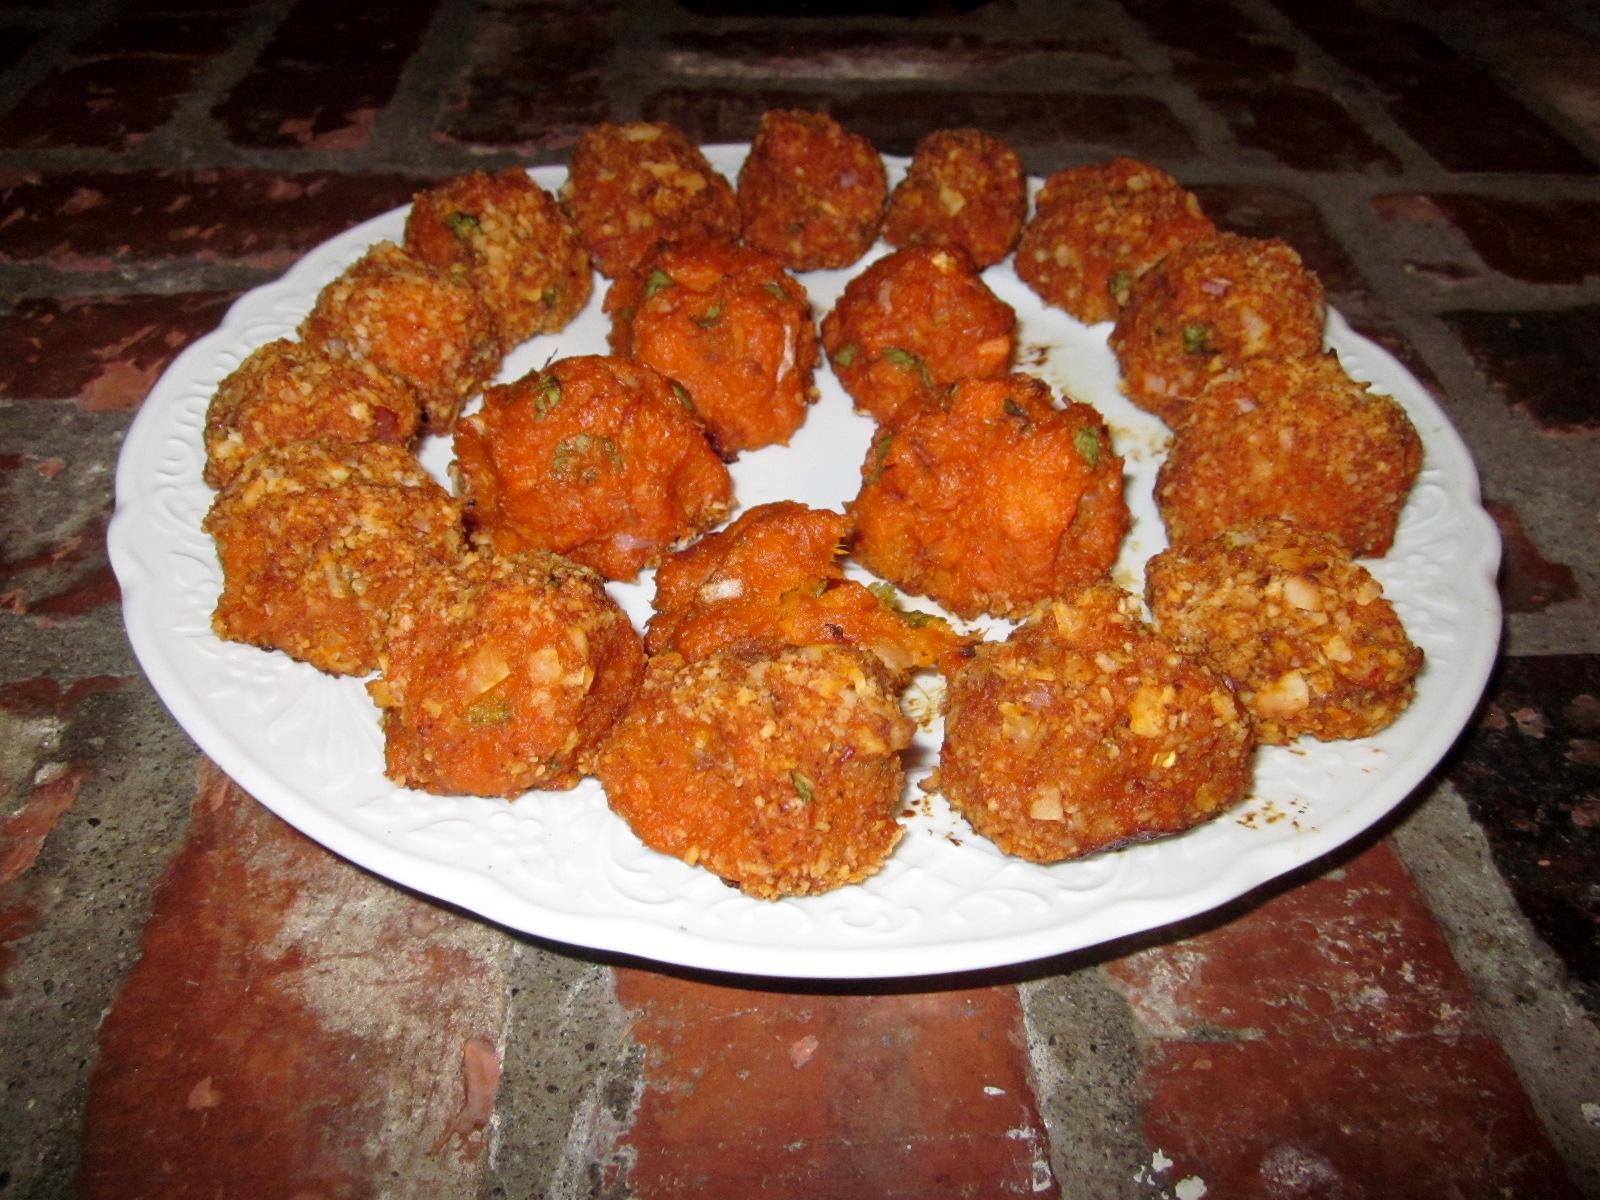 Savoury Baked Sweet Potato Balls | Fatfree Vegan Recipes